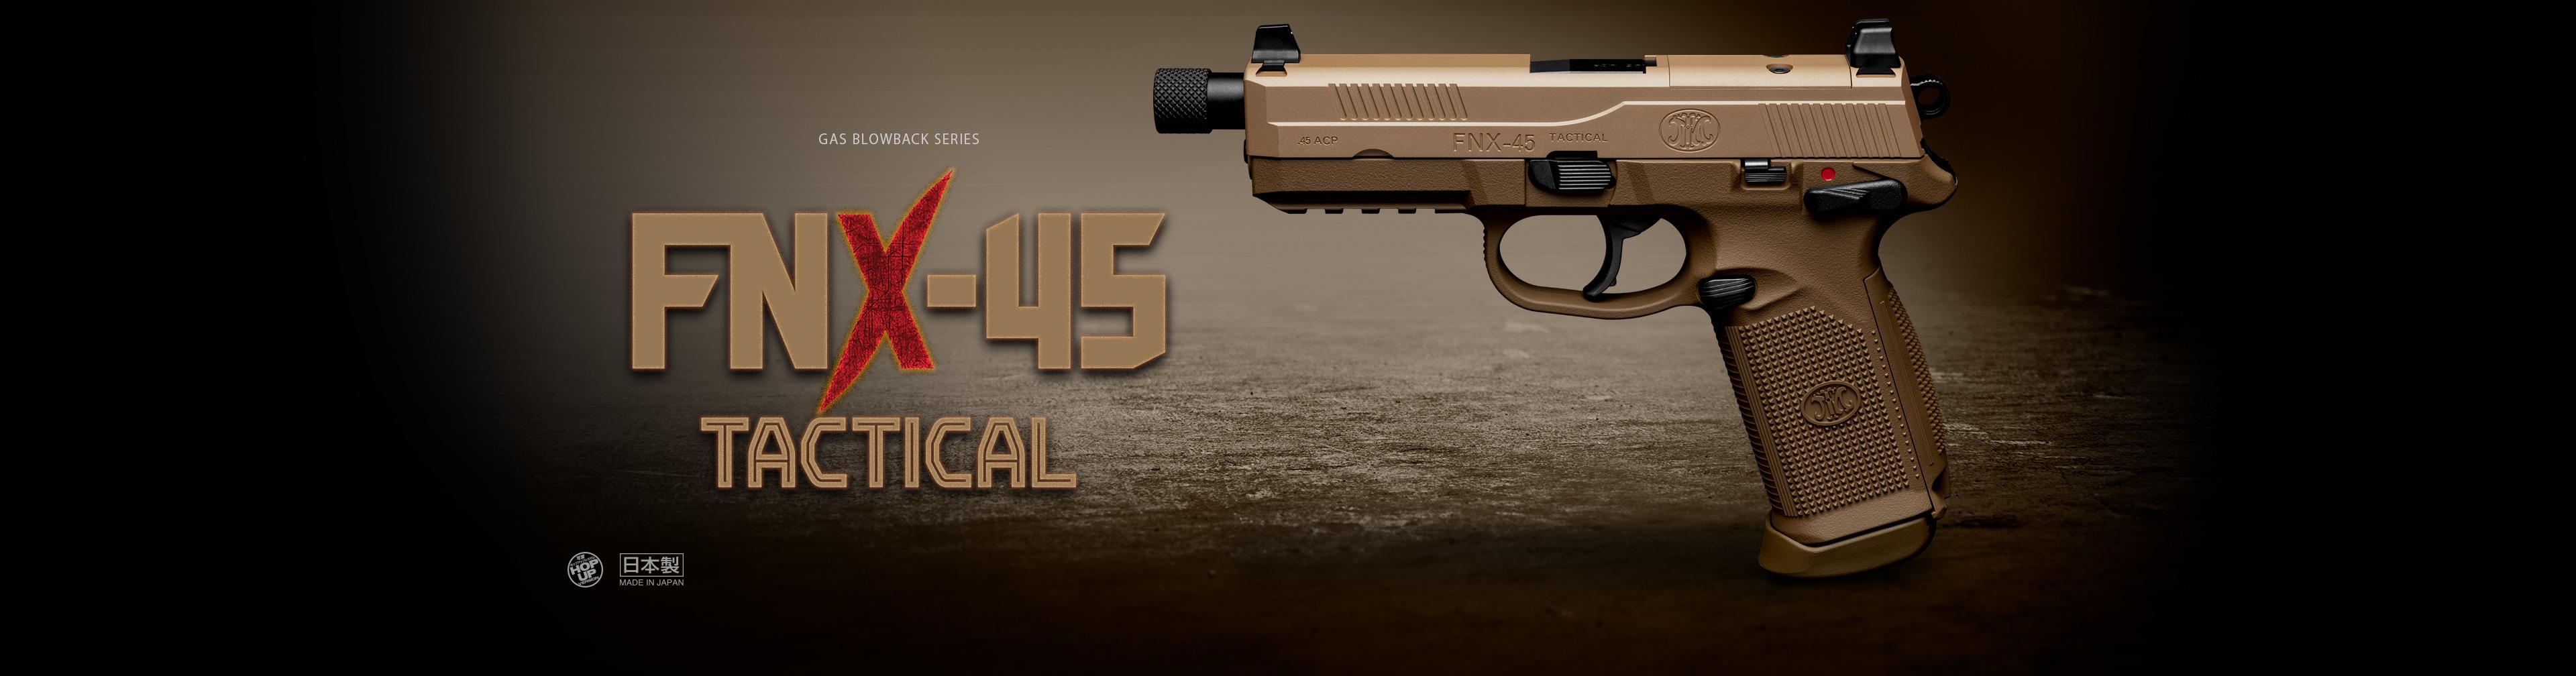 FNX-45タクティカル